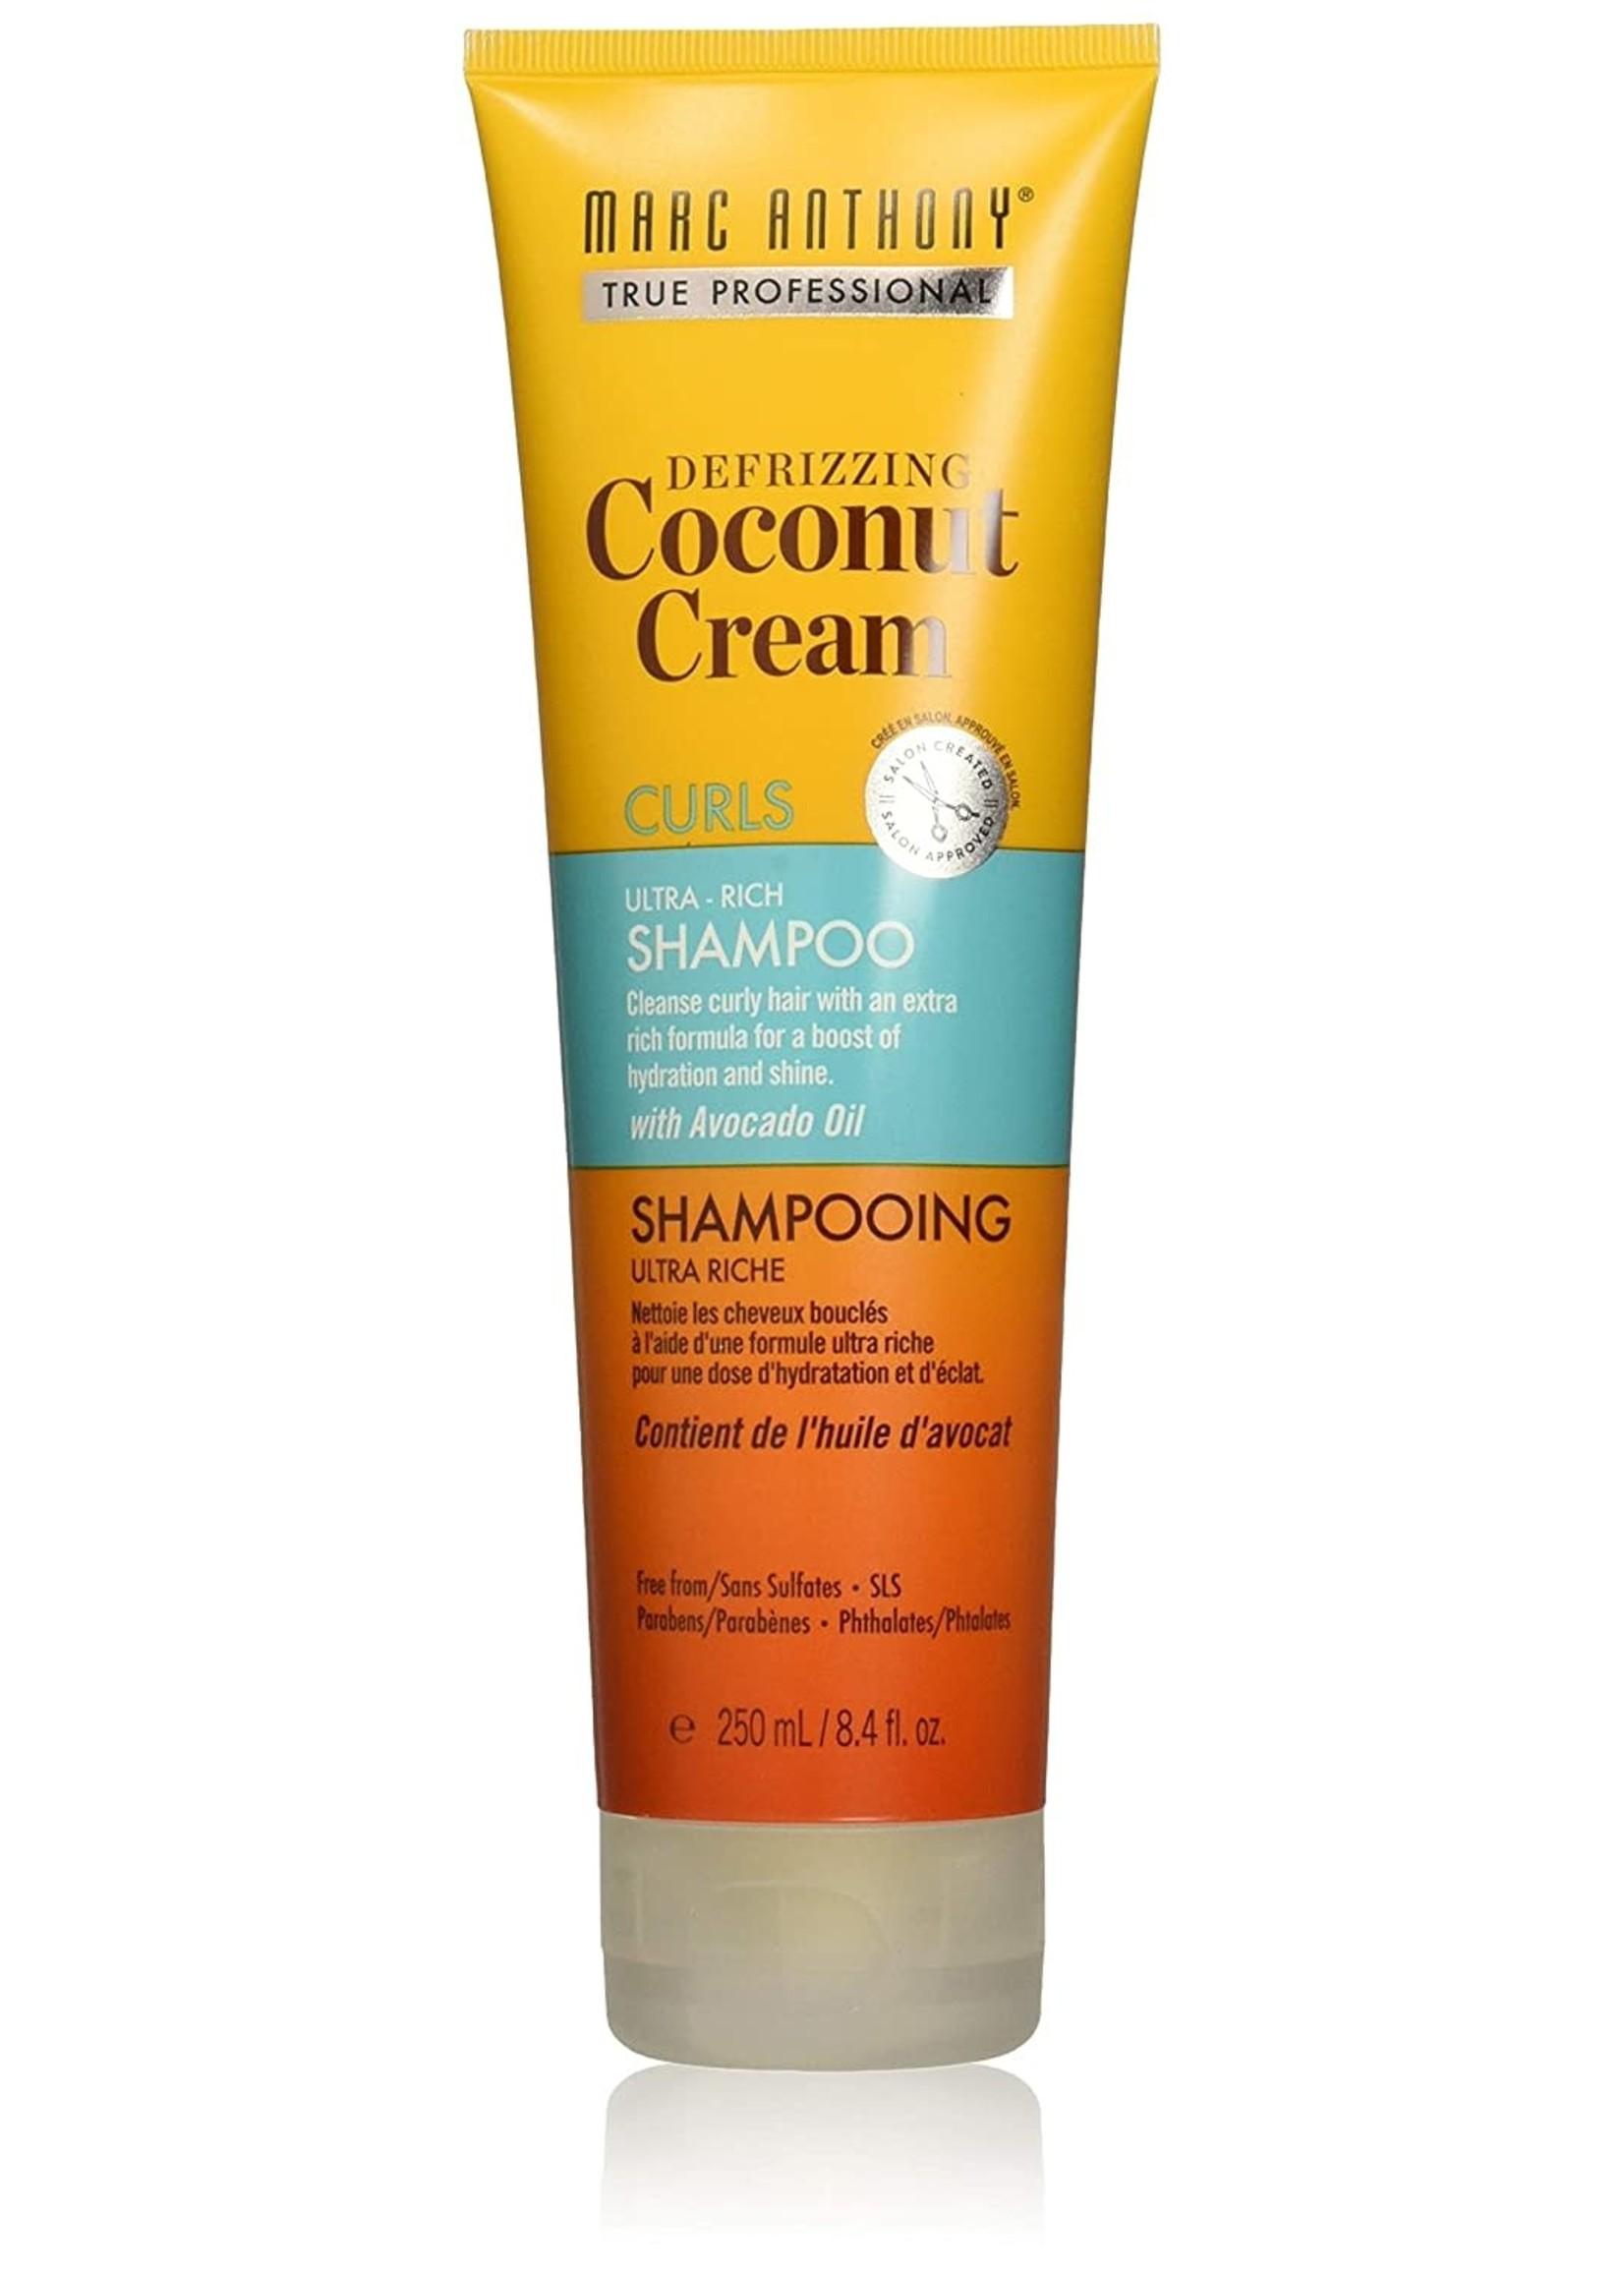 Marc Anthony DefrizzingCoconut Cream Shampoo